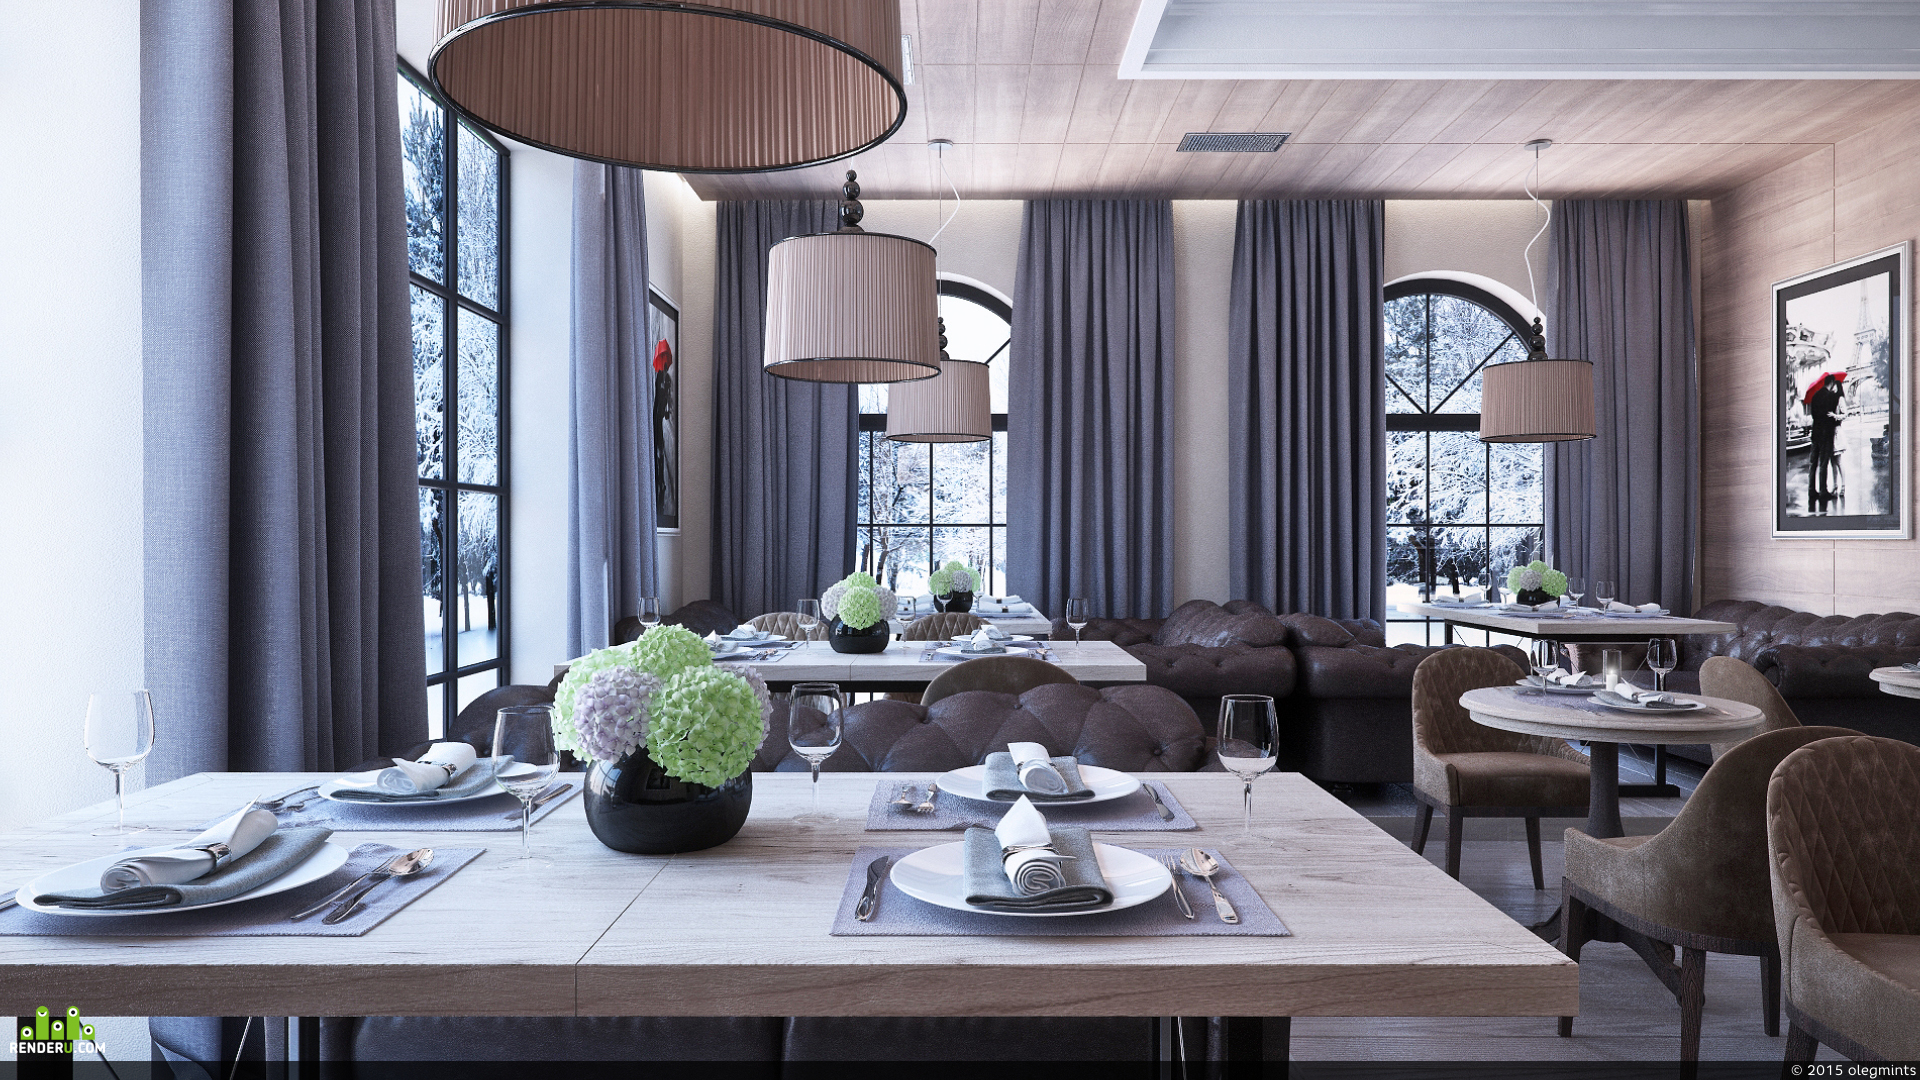 preview Cafe design in Saint-Petersburg